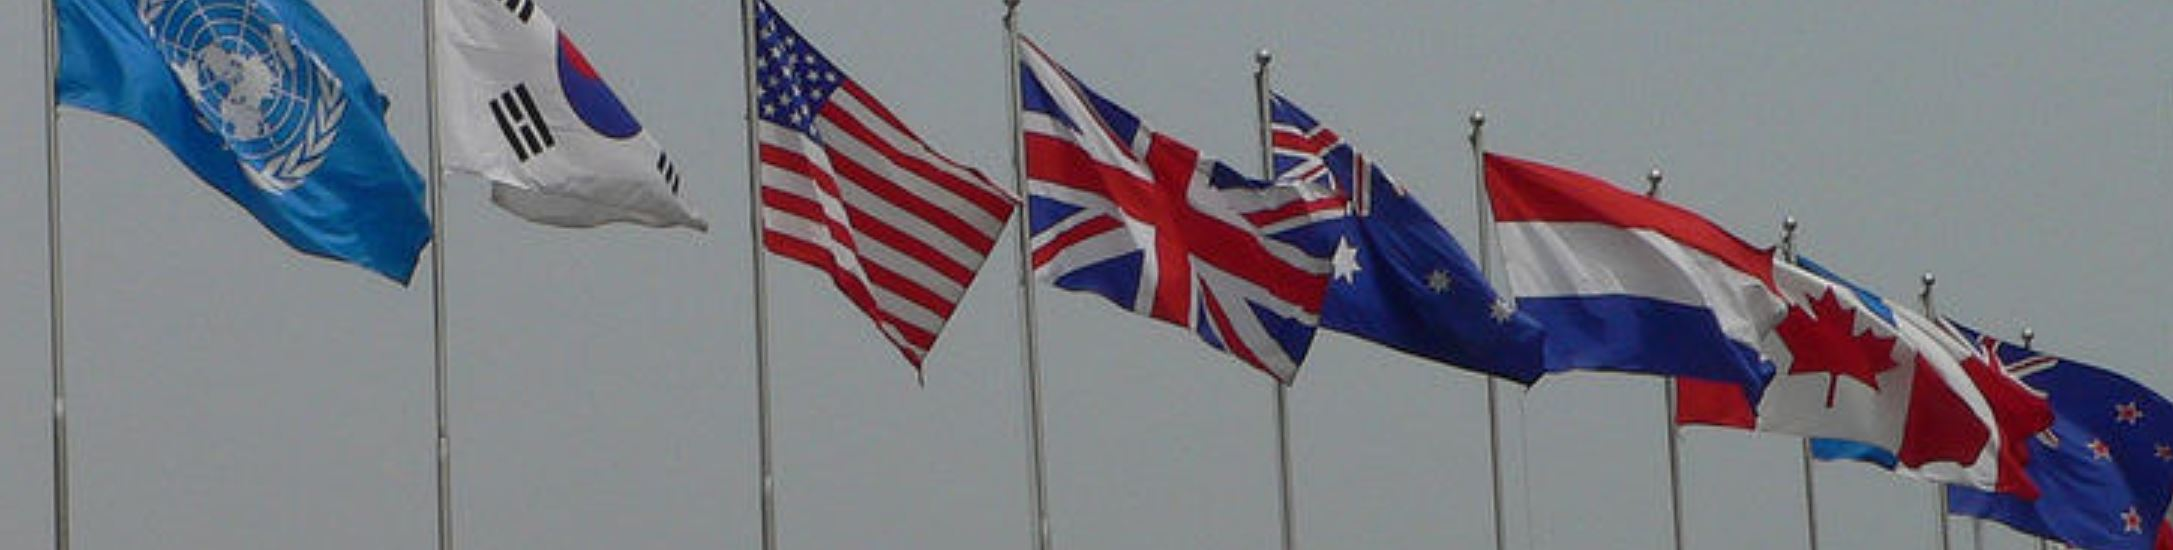 flags of world.JPG